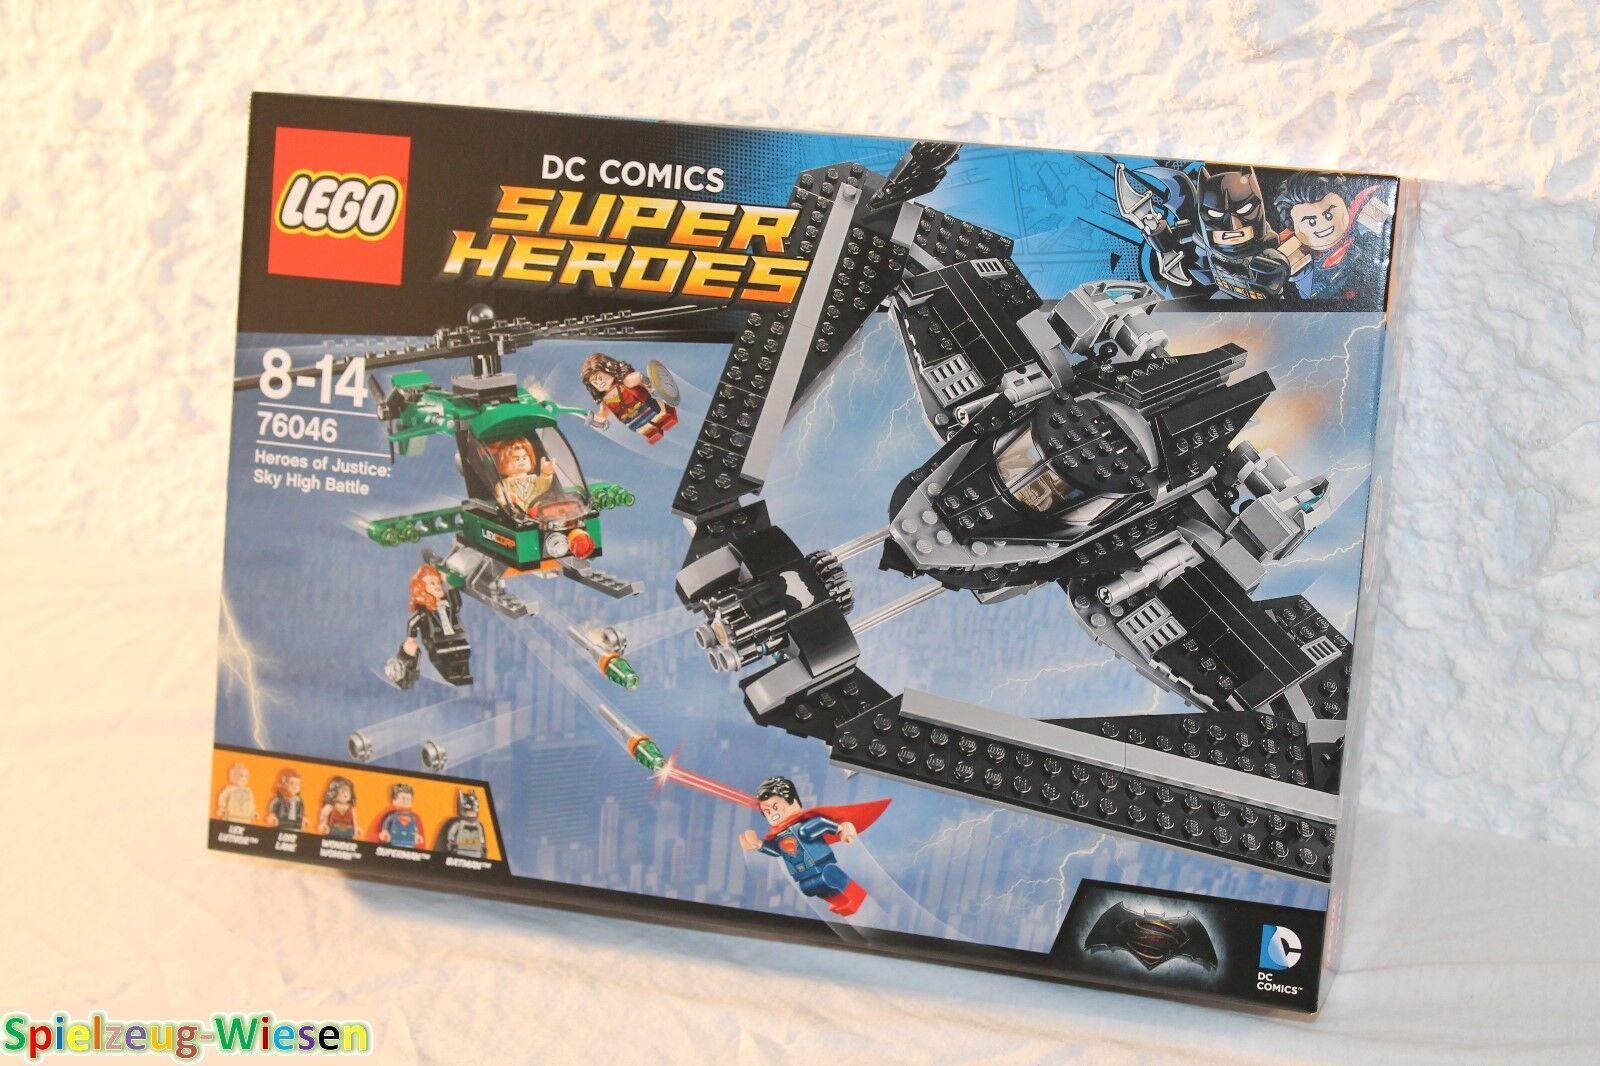 LEGO® DC DC DC COMICS™ Super Heroes 76046 Duell in der Luft - NEU & OVP - 310169